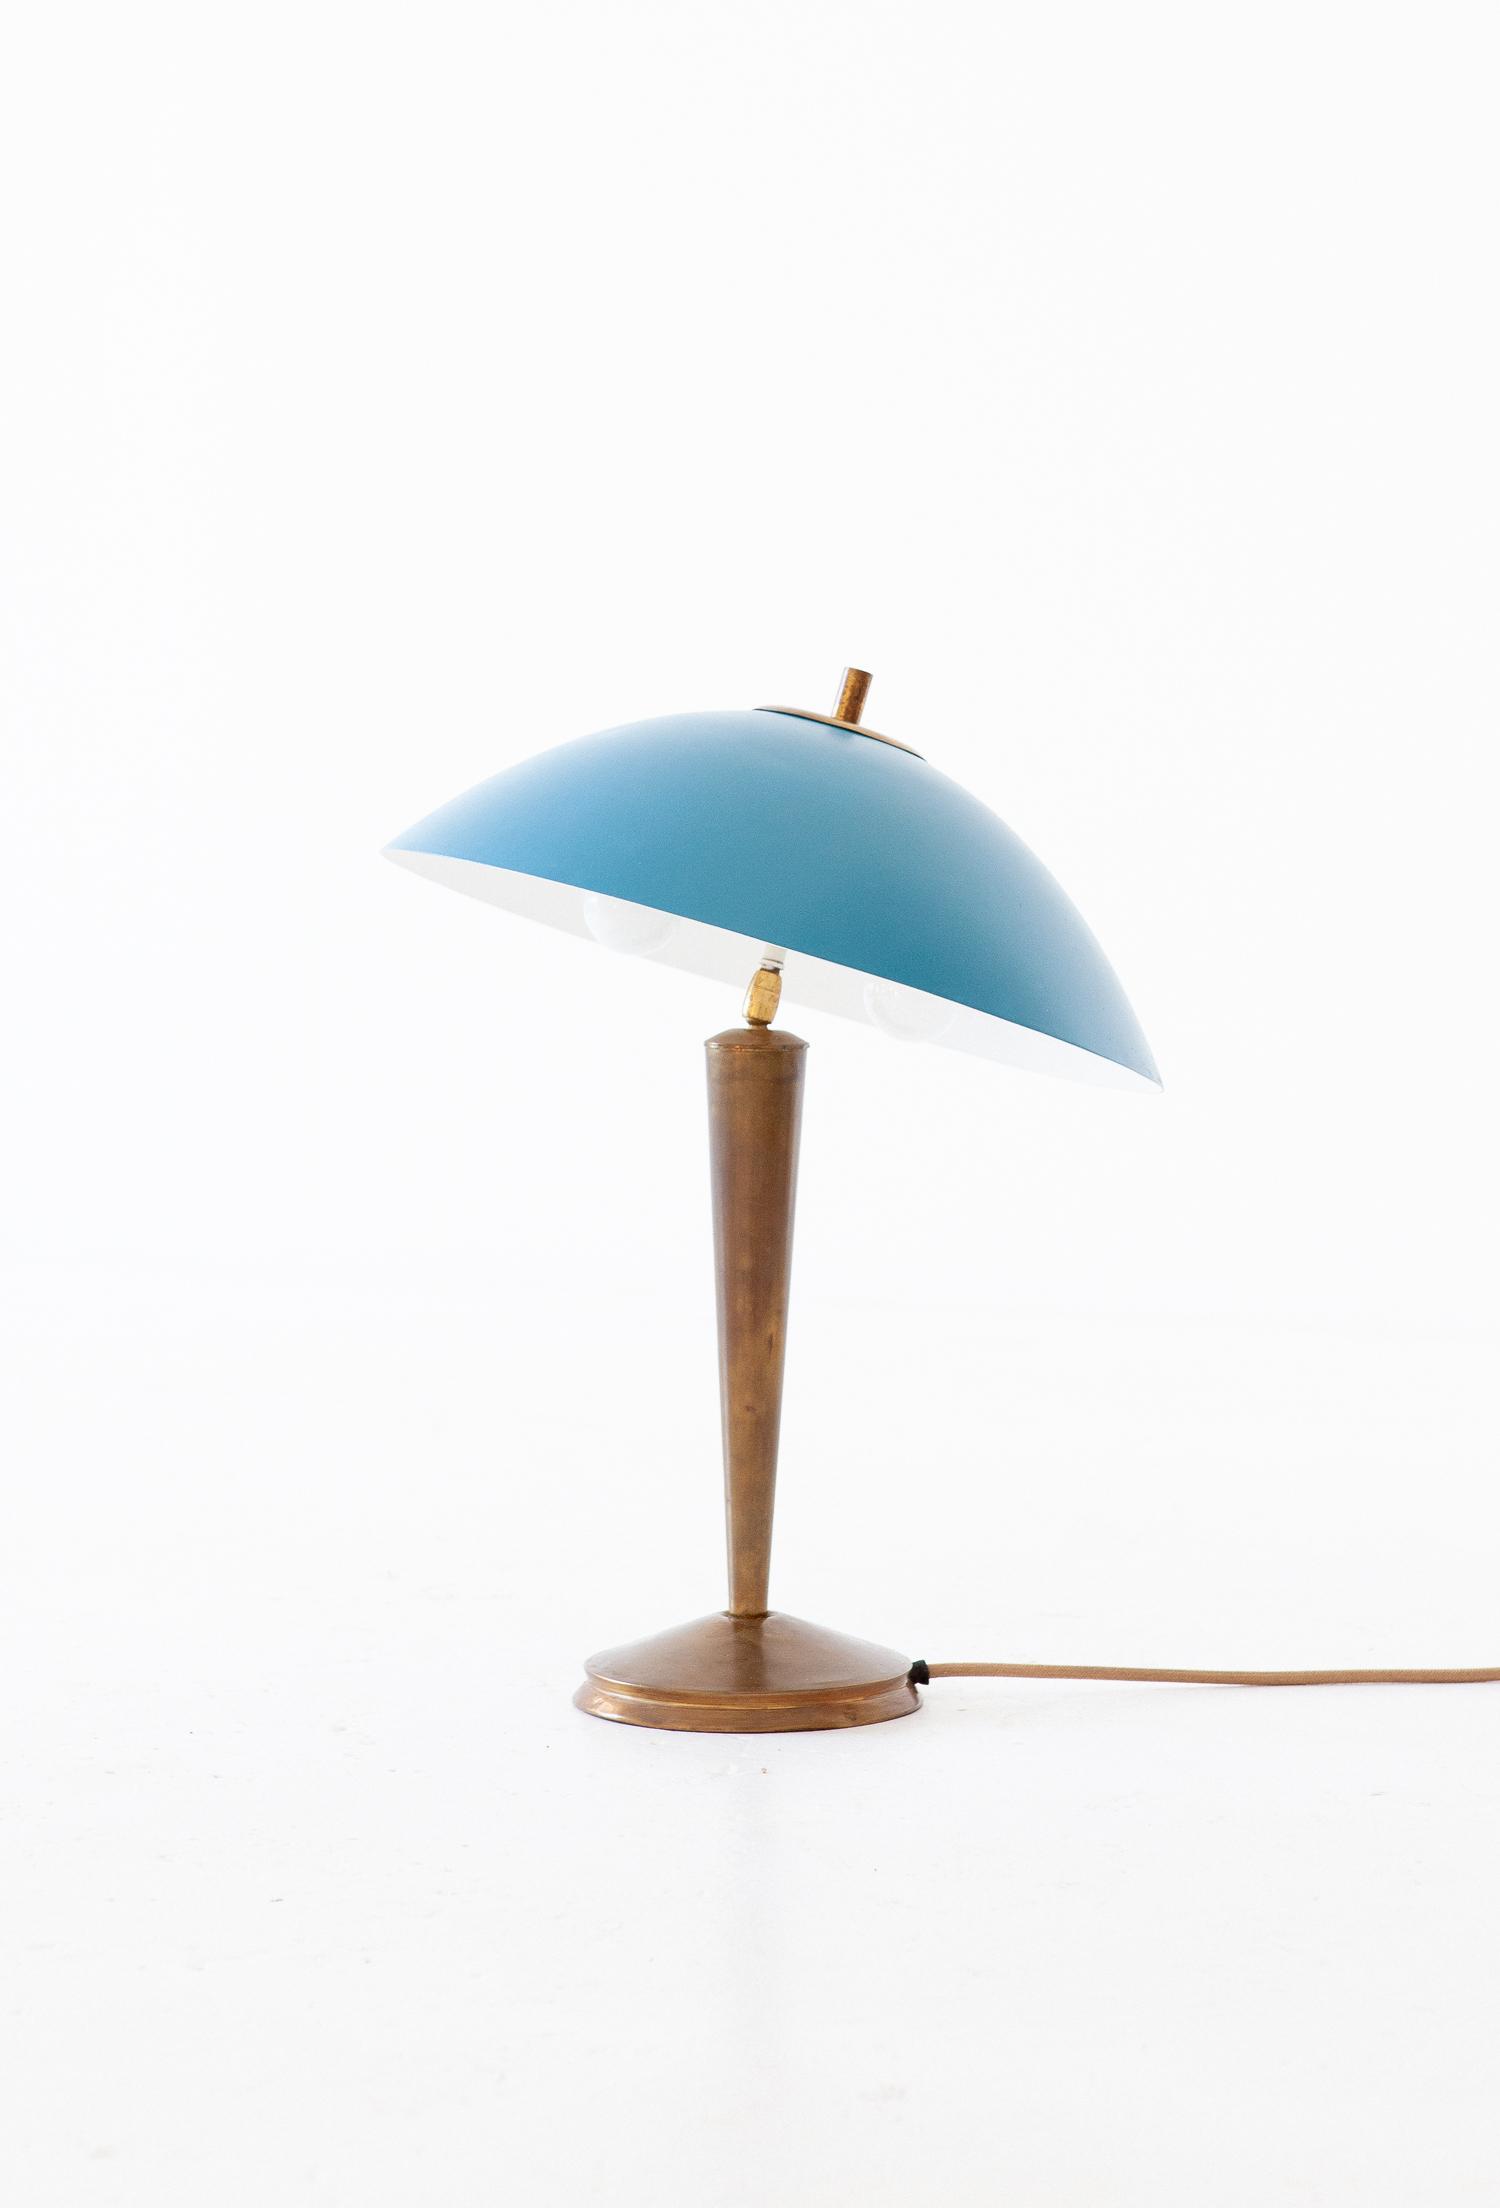 1950s-italian-blue-brass-table-lamp-2-L78